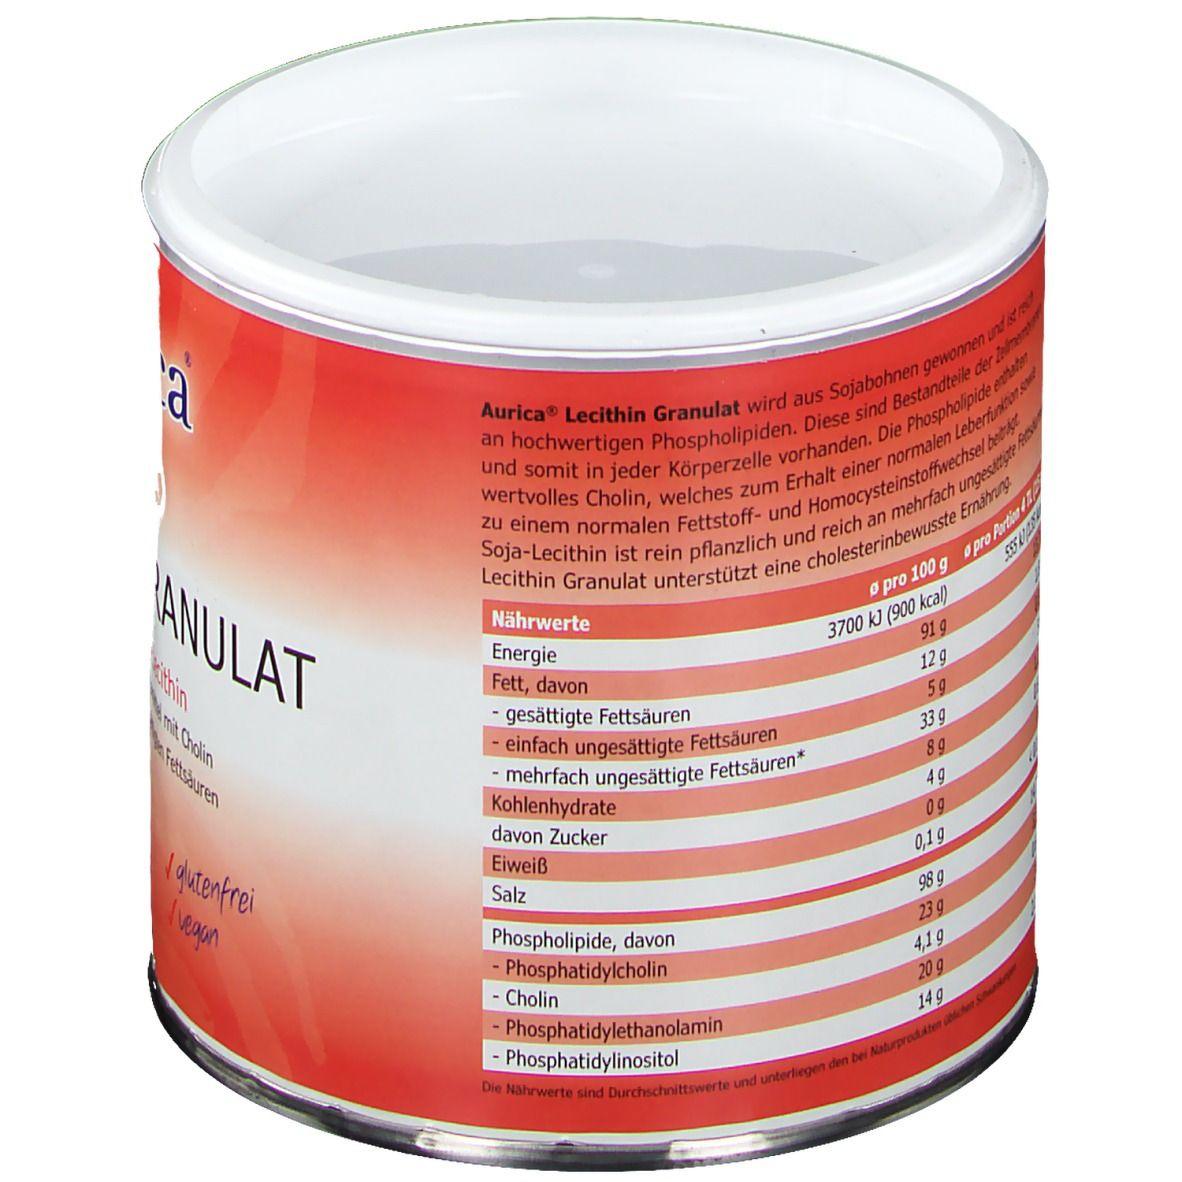 Aurica® Lecithin Granulat